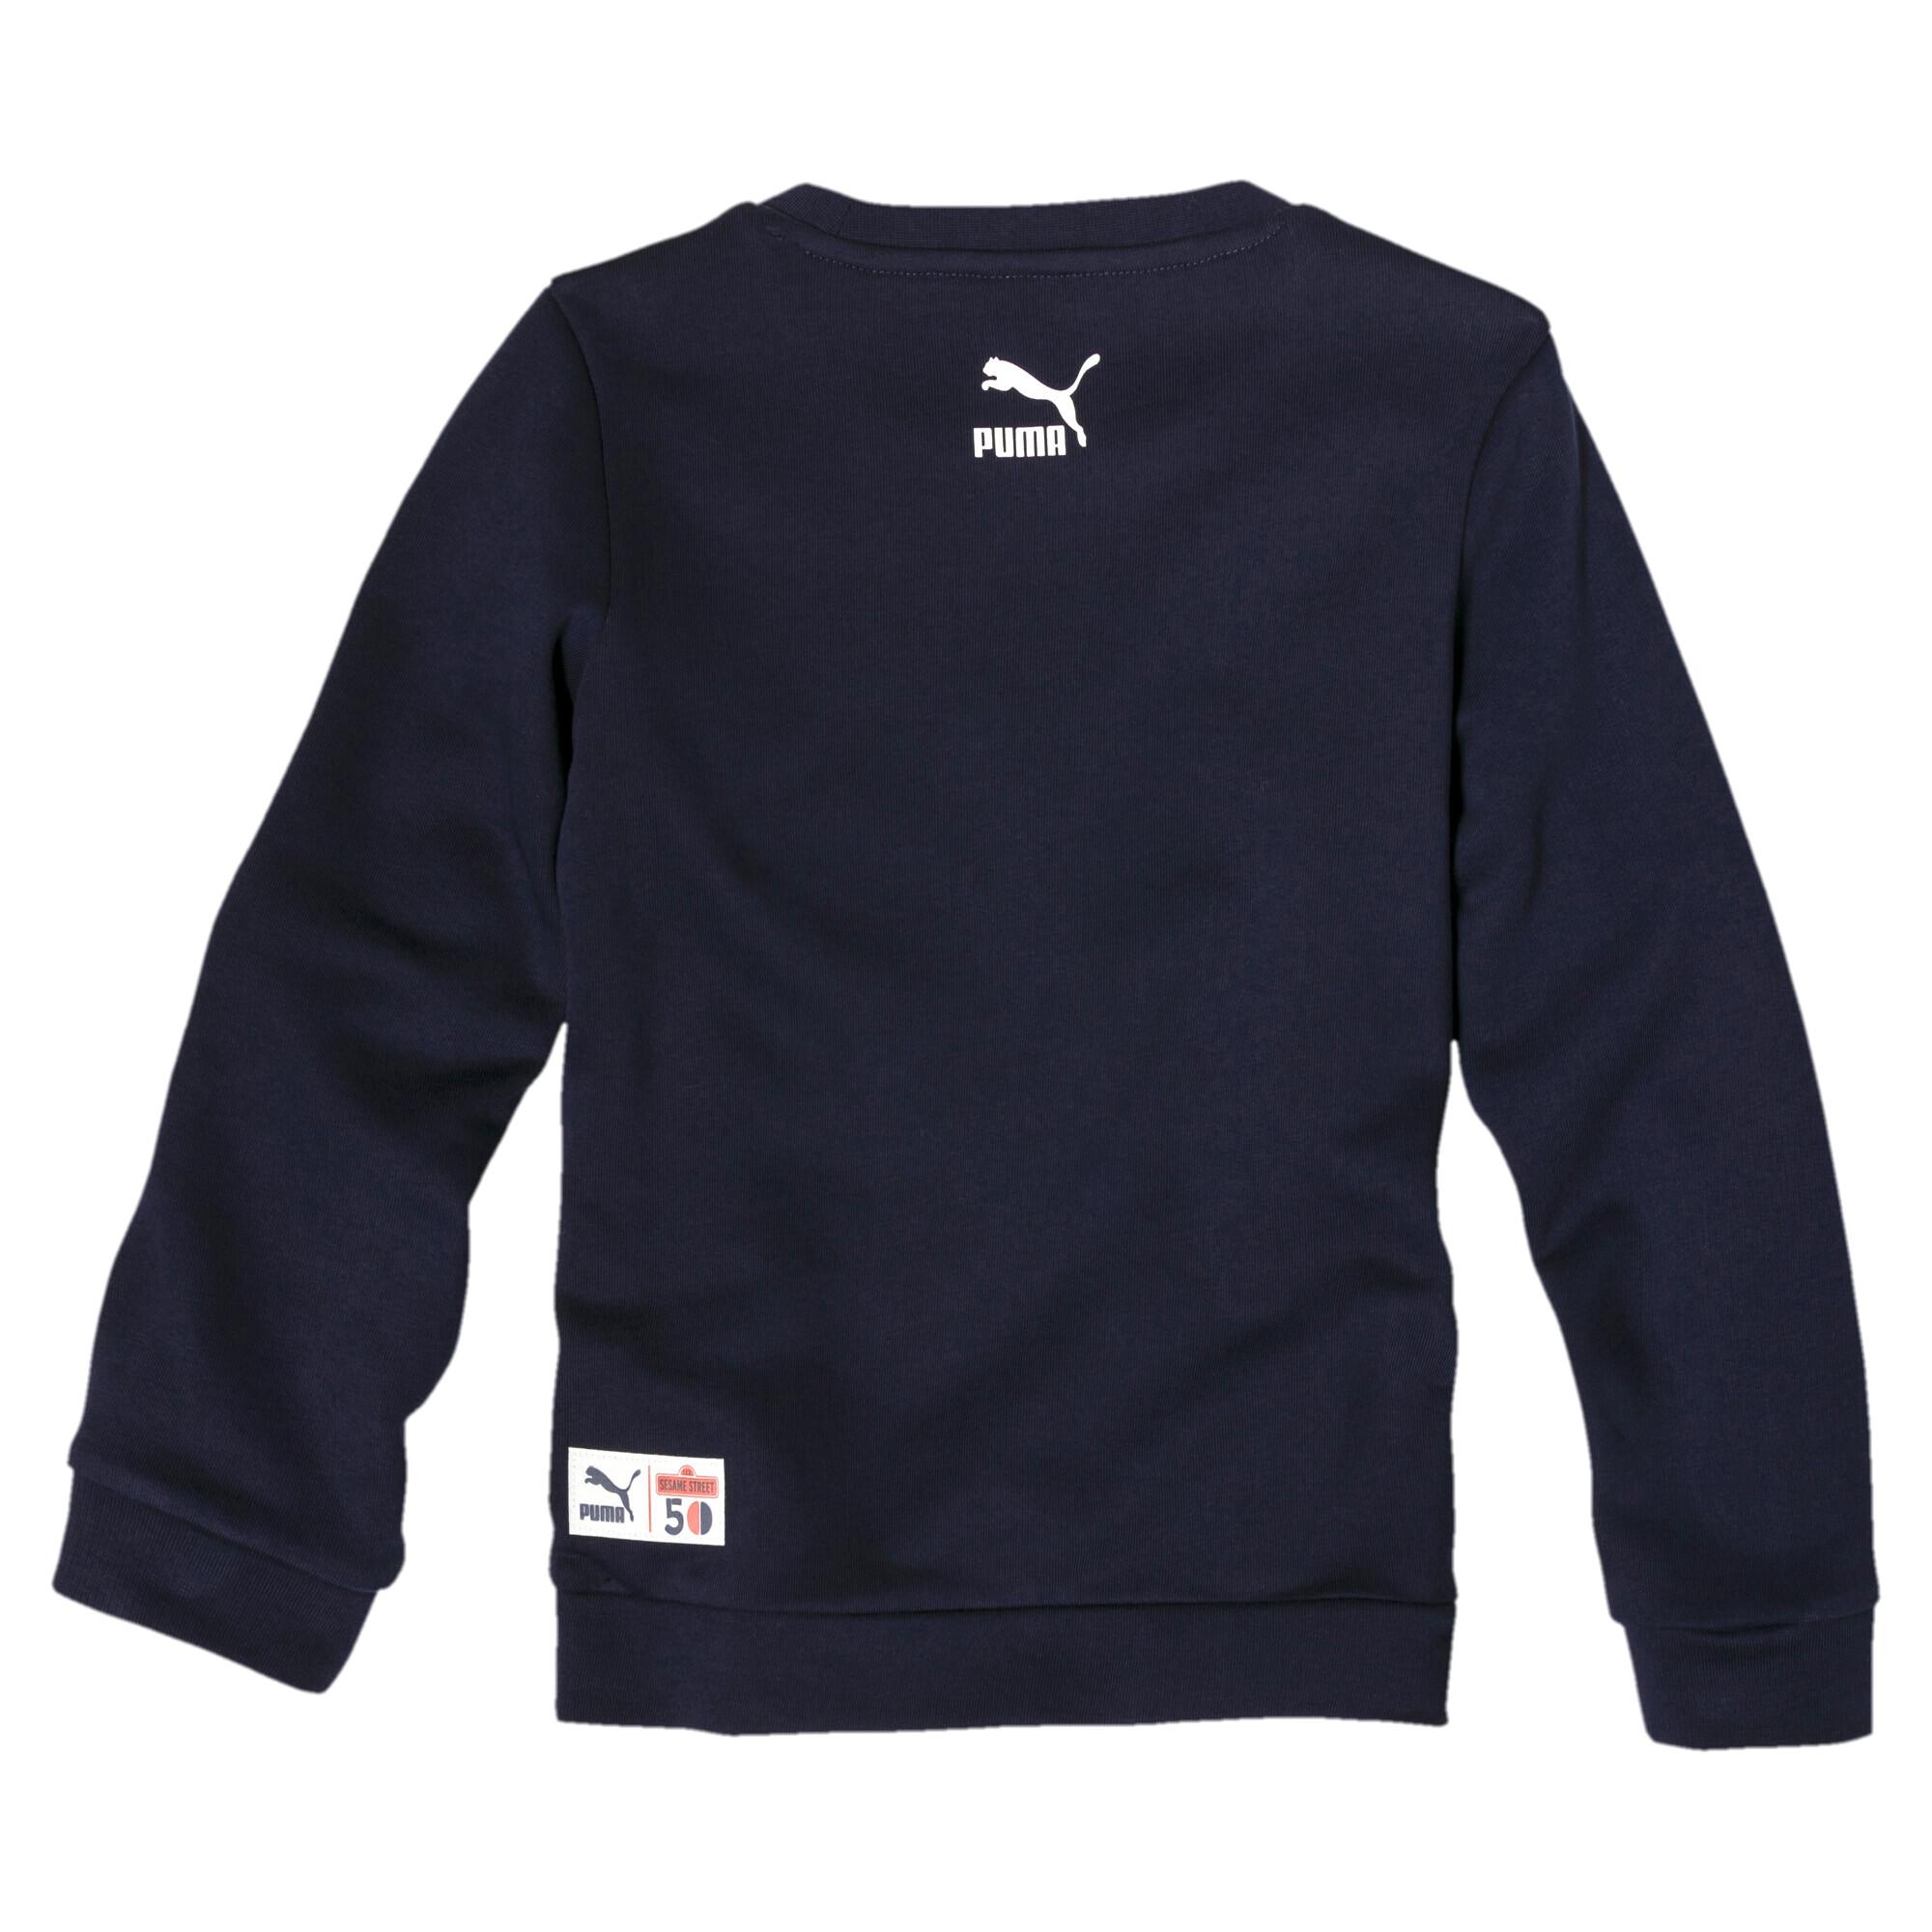 Image Puma PUMA x SESAME STREET Boy's Crewneck Sweatshirt INF #2